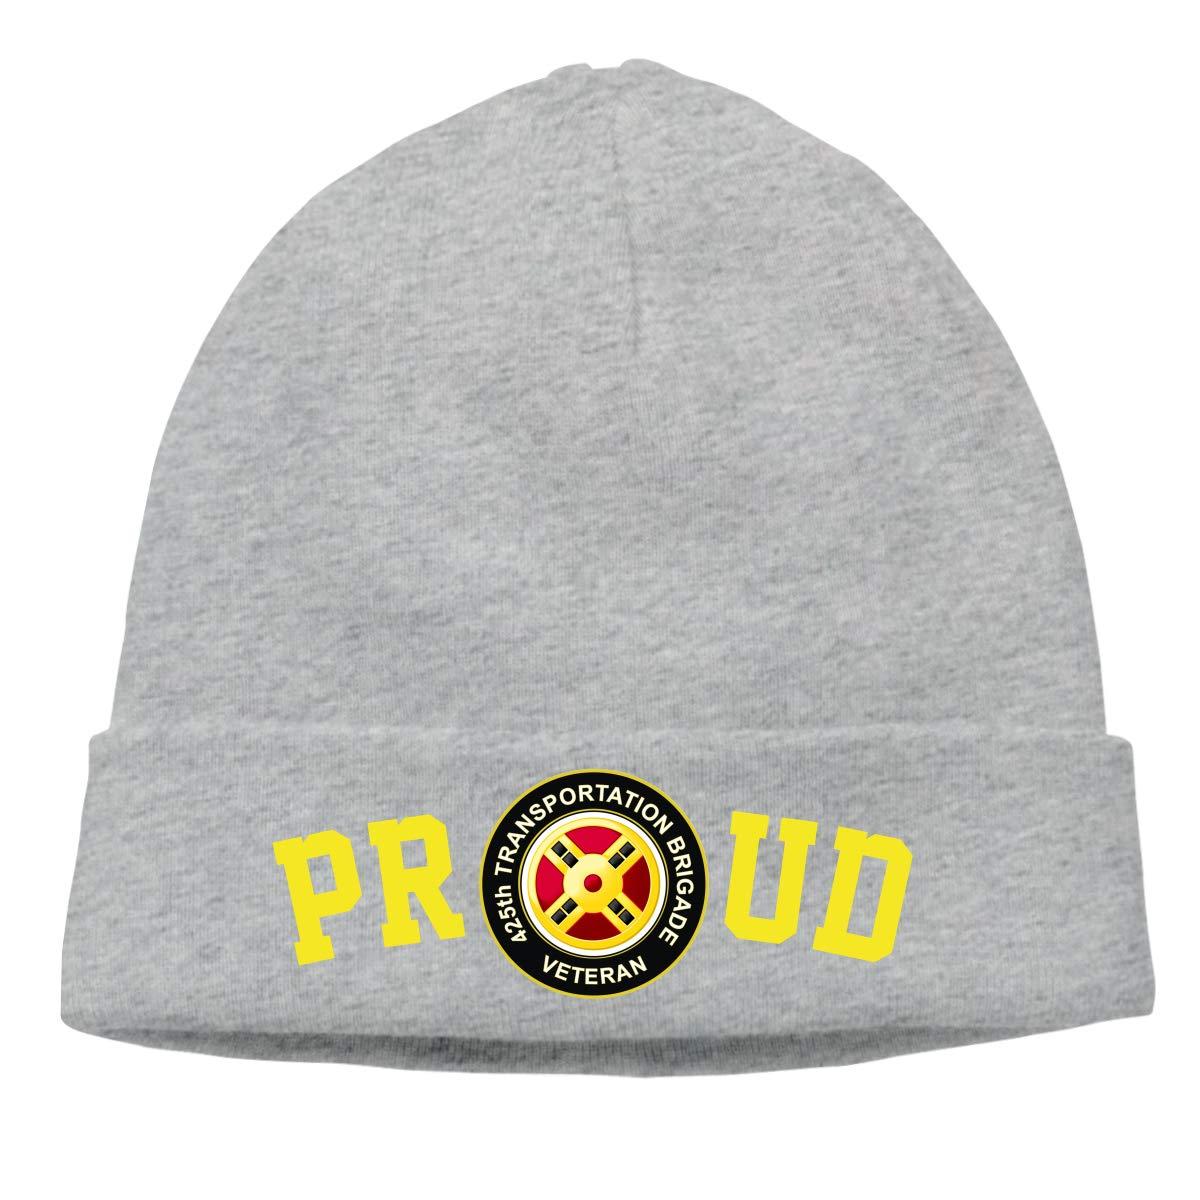 FORDSAN CP Proud US Army 425th Transportation Brigade Veteran Mens Beanie Cap Skull Cap Winter Warm Knitting Hats.